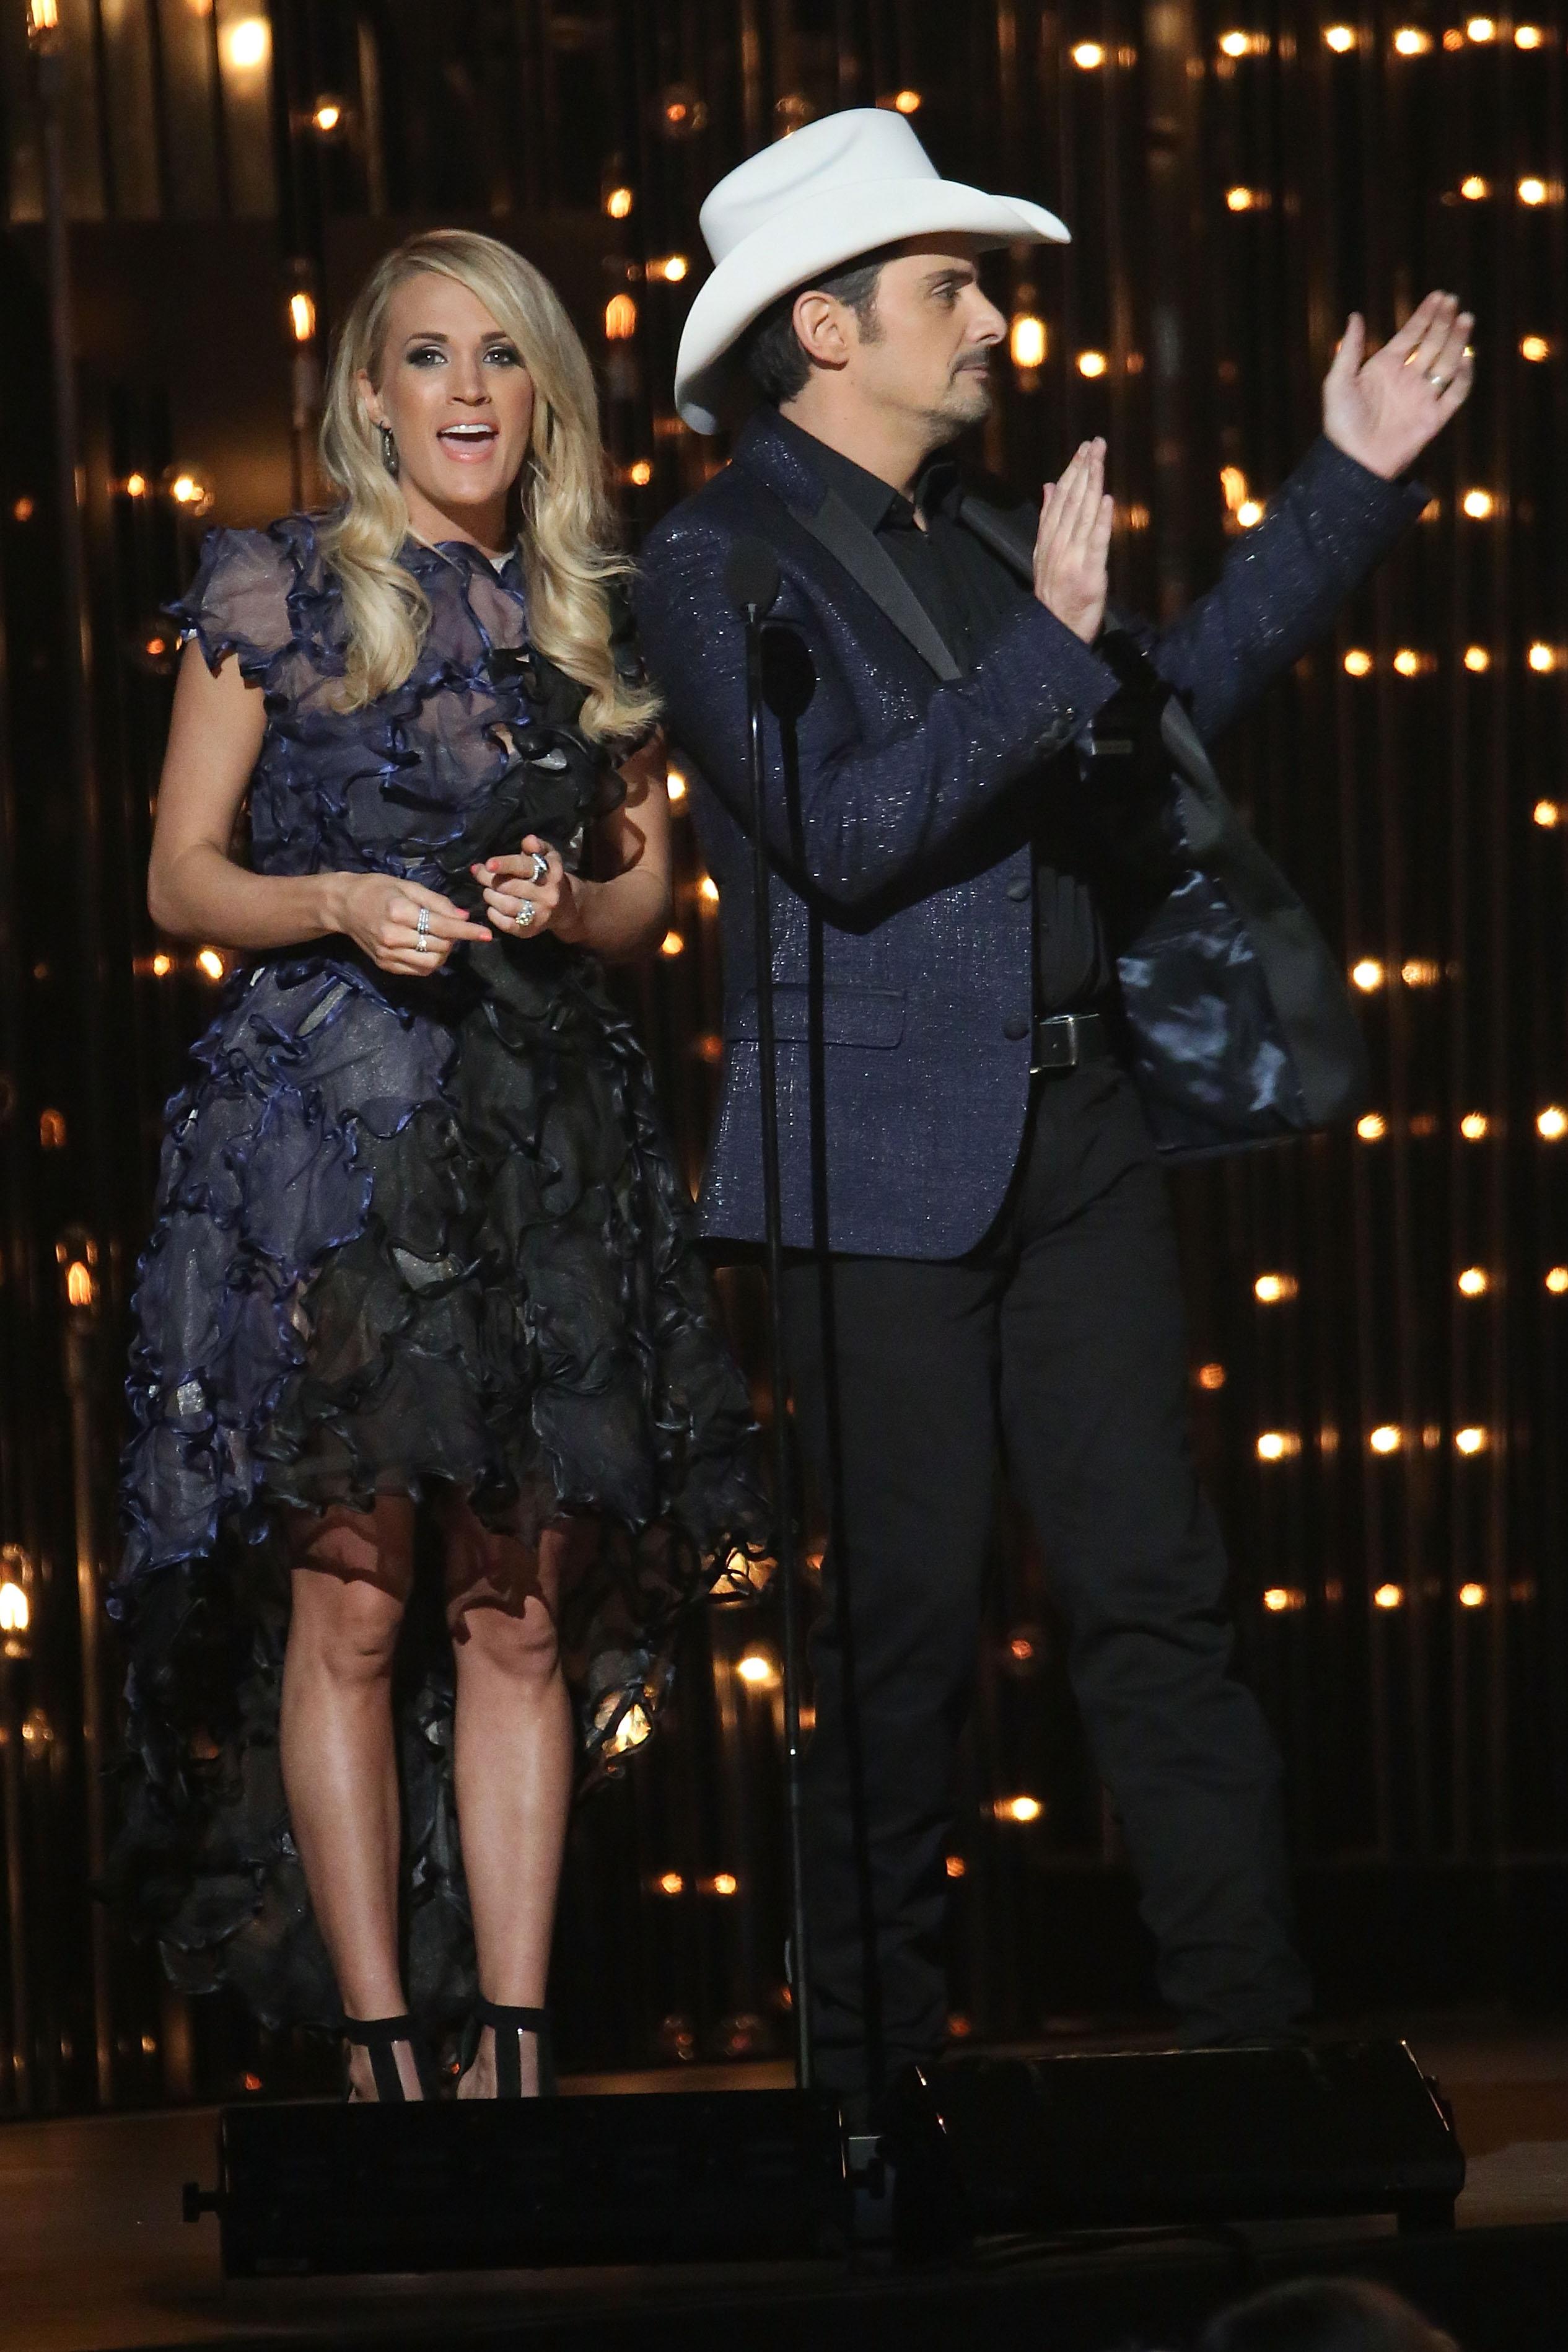 49th Annual CMA Awards - Show